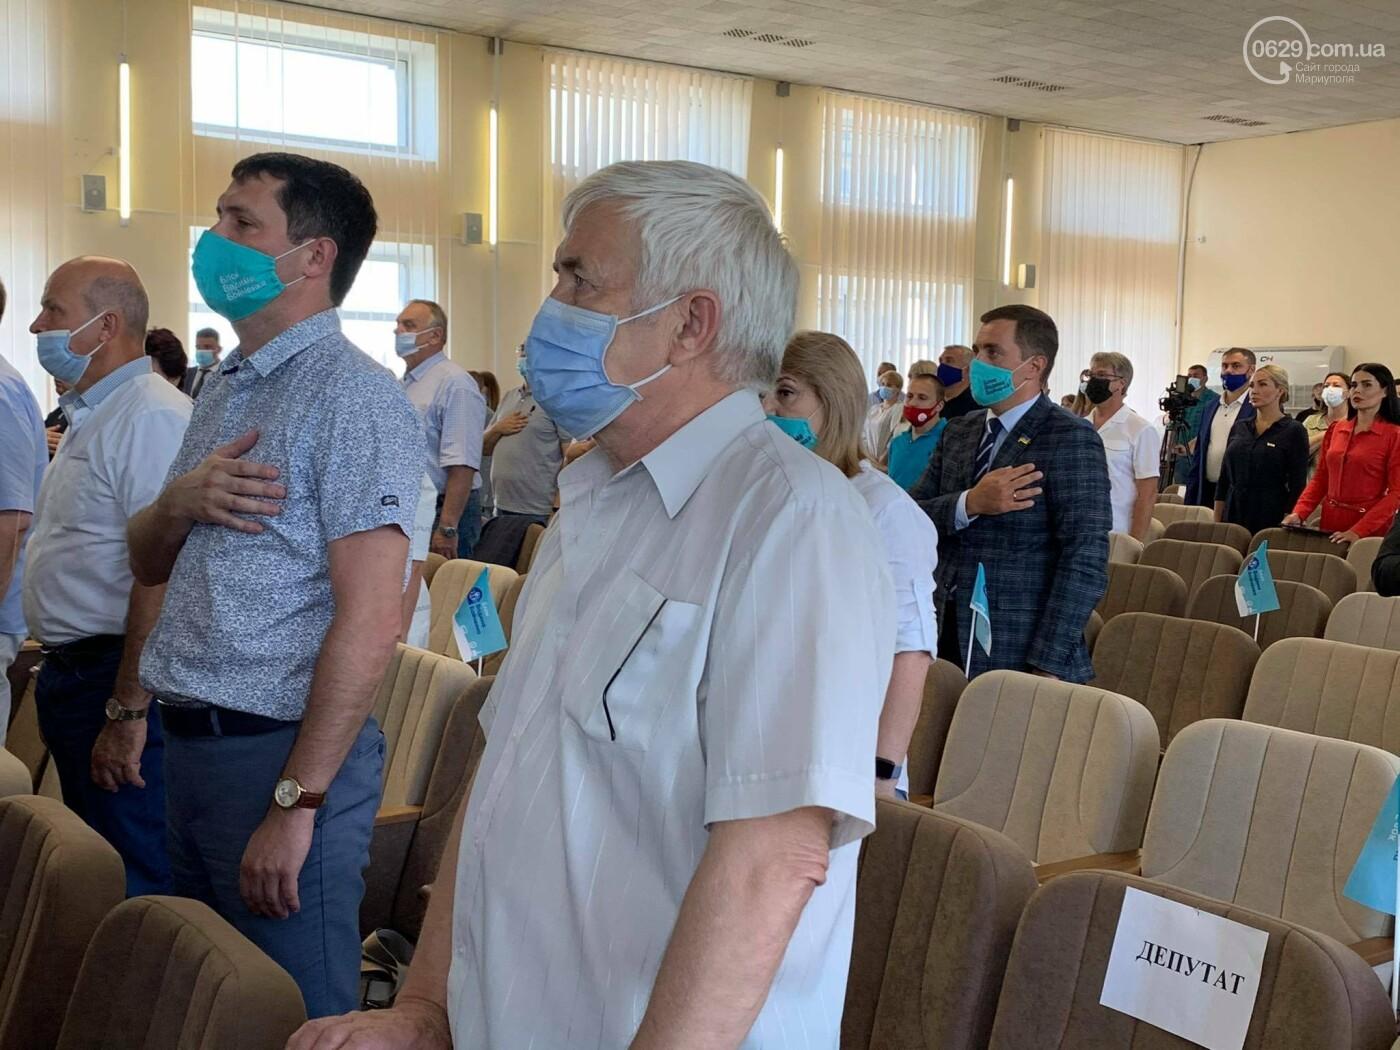 В Мариуполе стартовала сессия горсовета, - ФОТО, фото-2